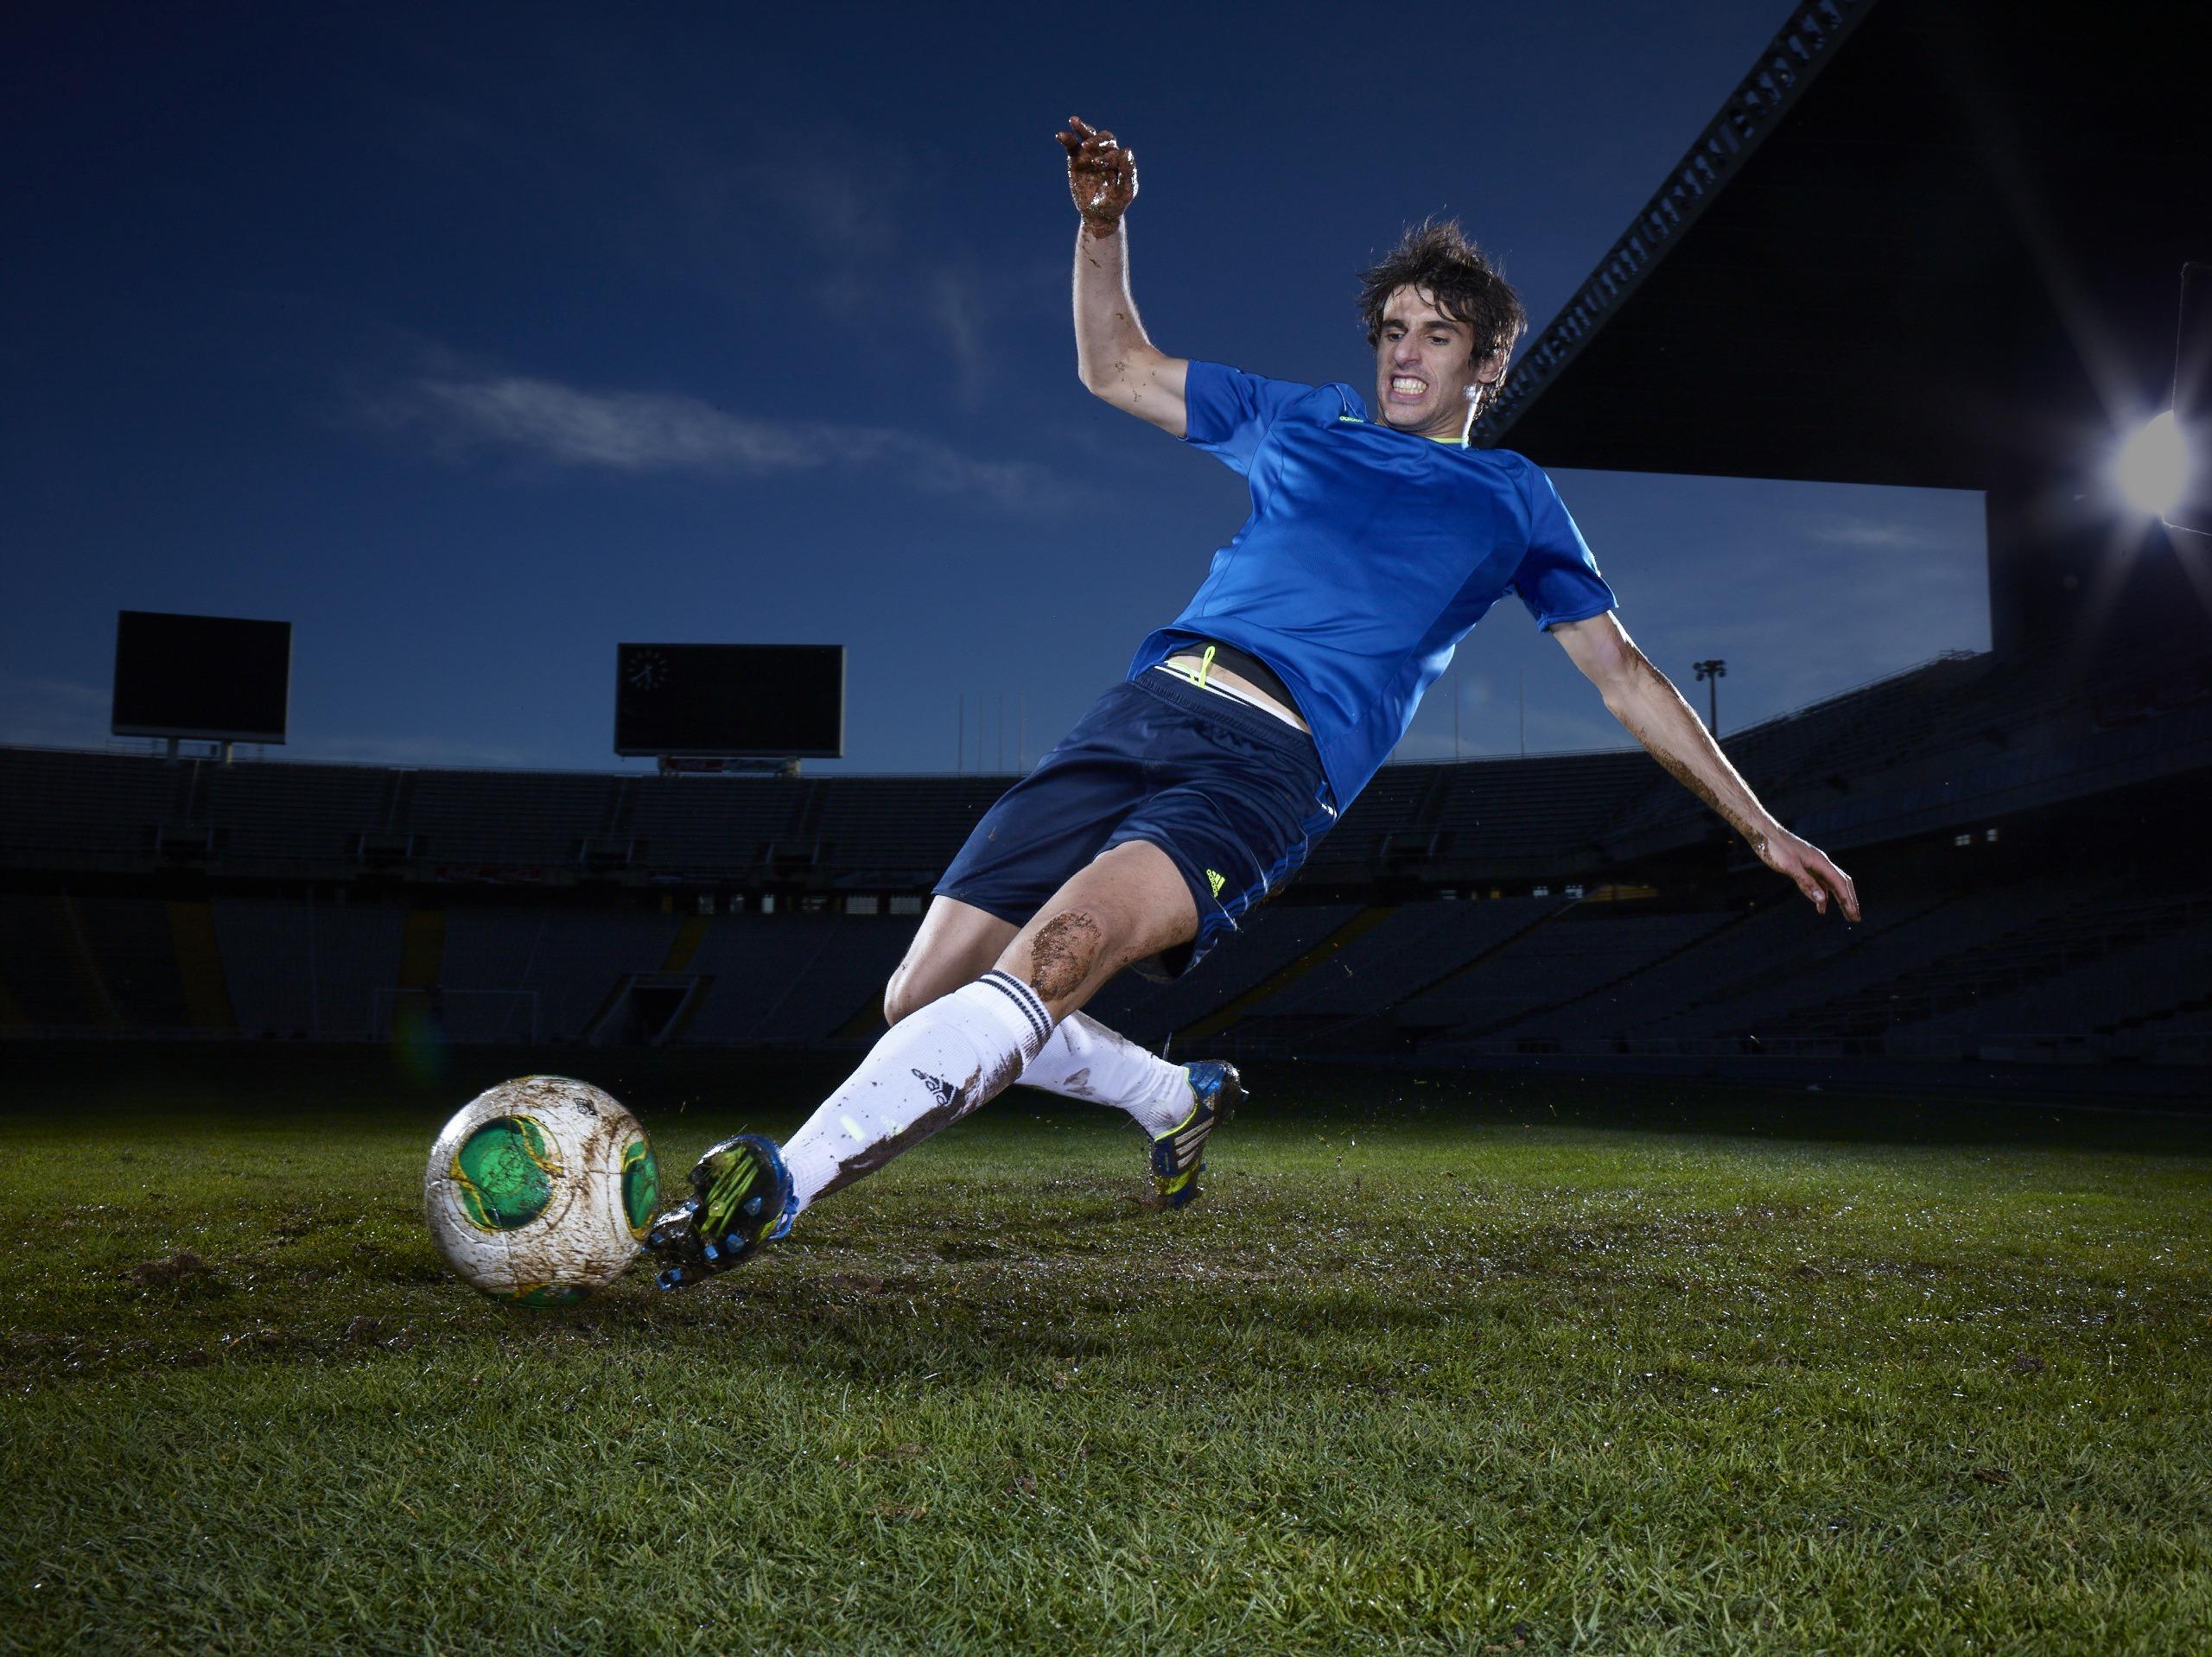 PHOTO: Adidas Press